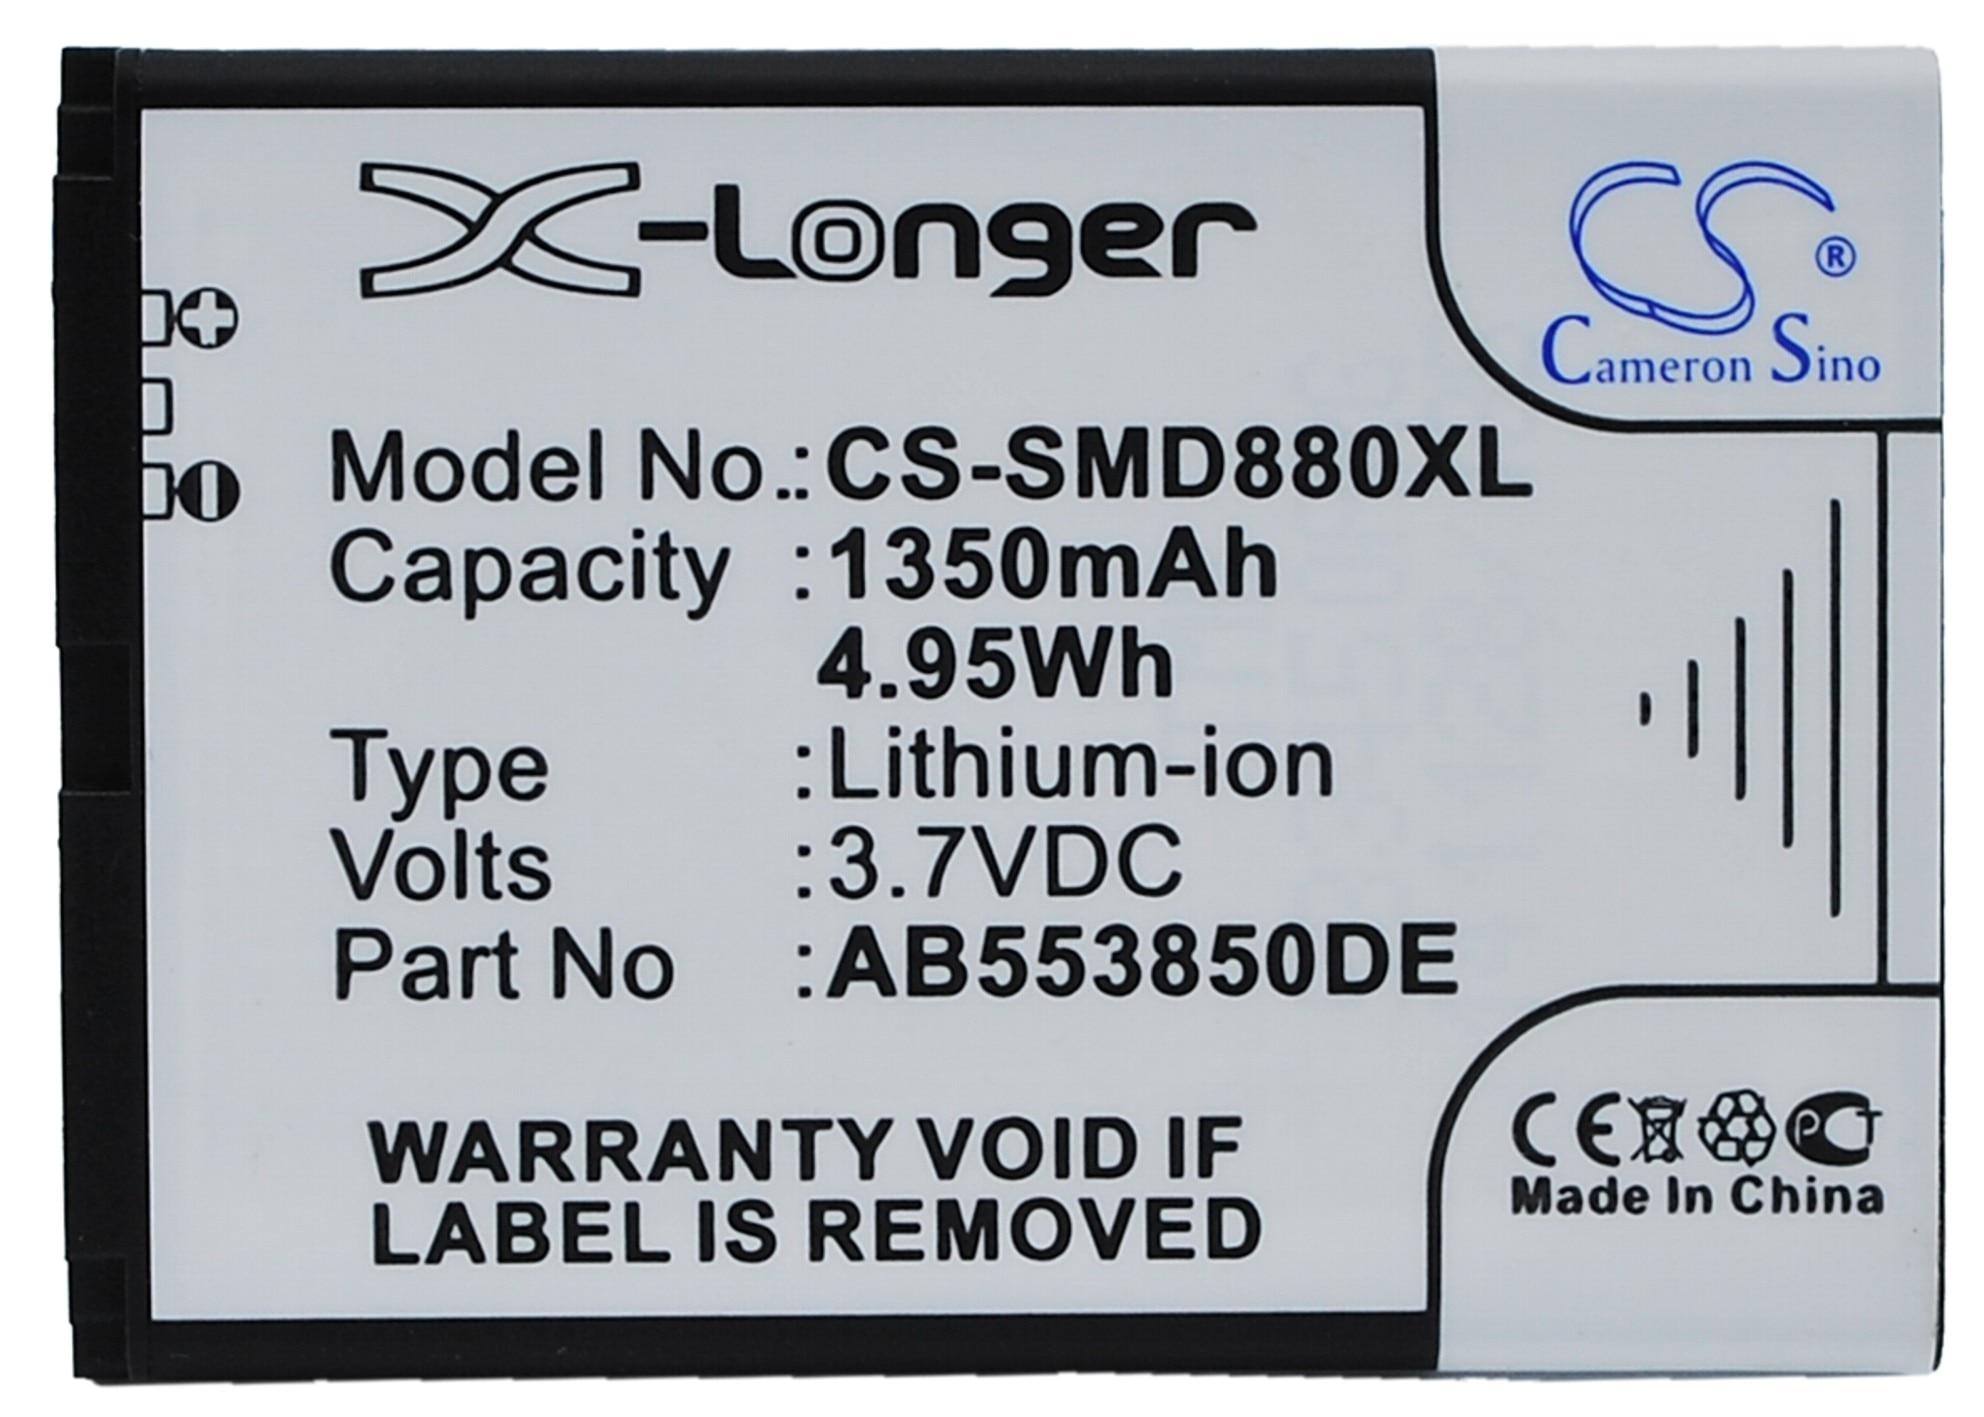 Cameron Sino 1350mAh Battery AB553850DC, AB553850DE for Samsung B5702C, B5712C, D880, D880i, D888, D988, I608, W599, W619, W629Cameron Sino 1350mAh Battery AB553850DC, AB553850DE for Samsung B5702C, B5712C, D880, D880i, D888, D988, I608, W599, W619, W629